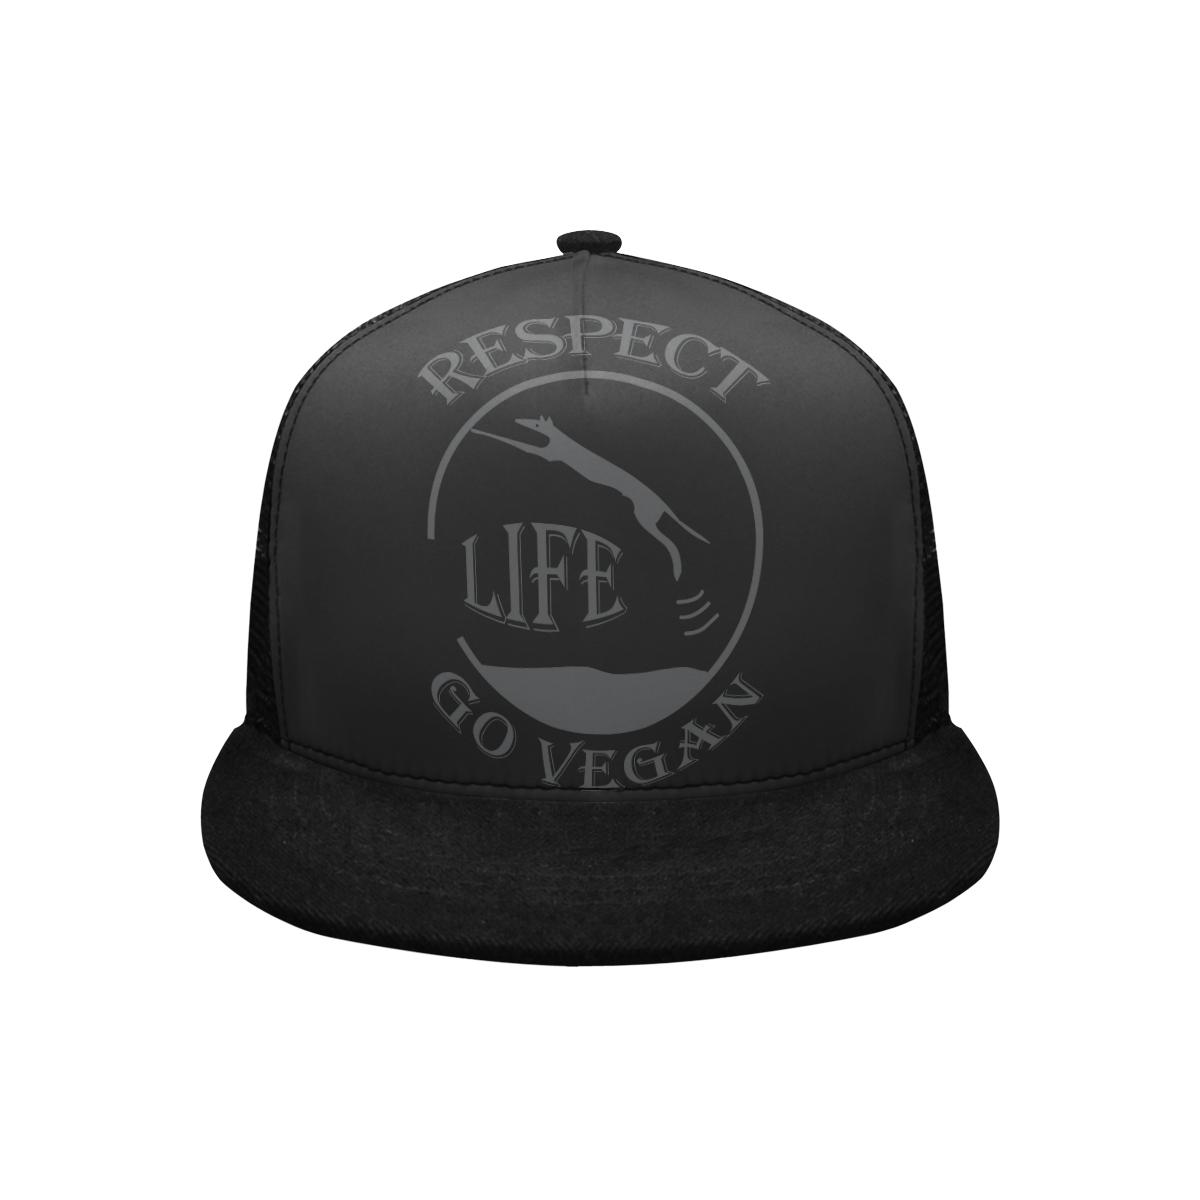 RESPECT LIFE GO VEGAN BASECAP Trucker Hat H (Front Panel Customization)